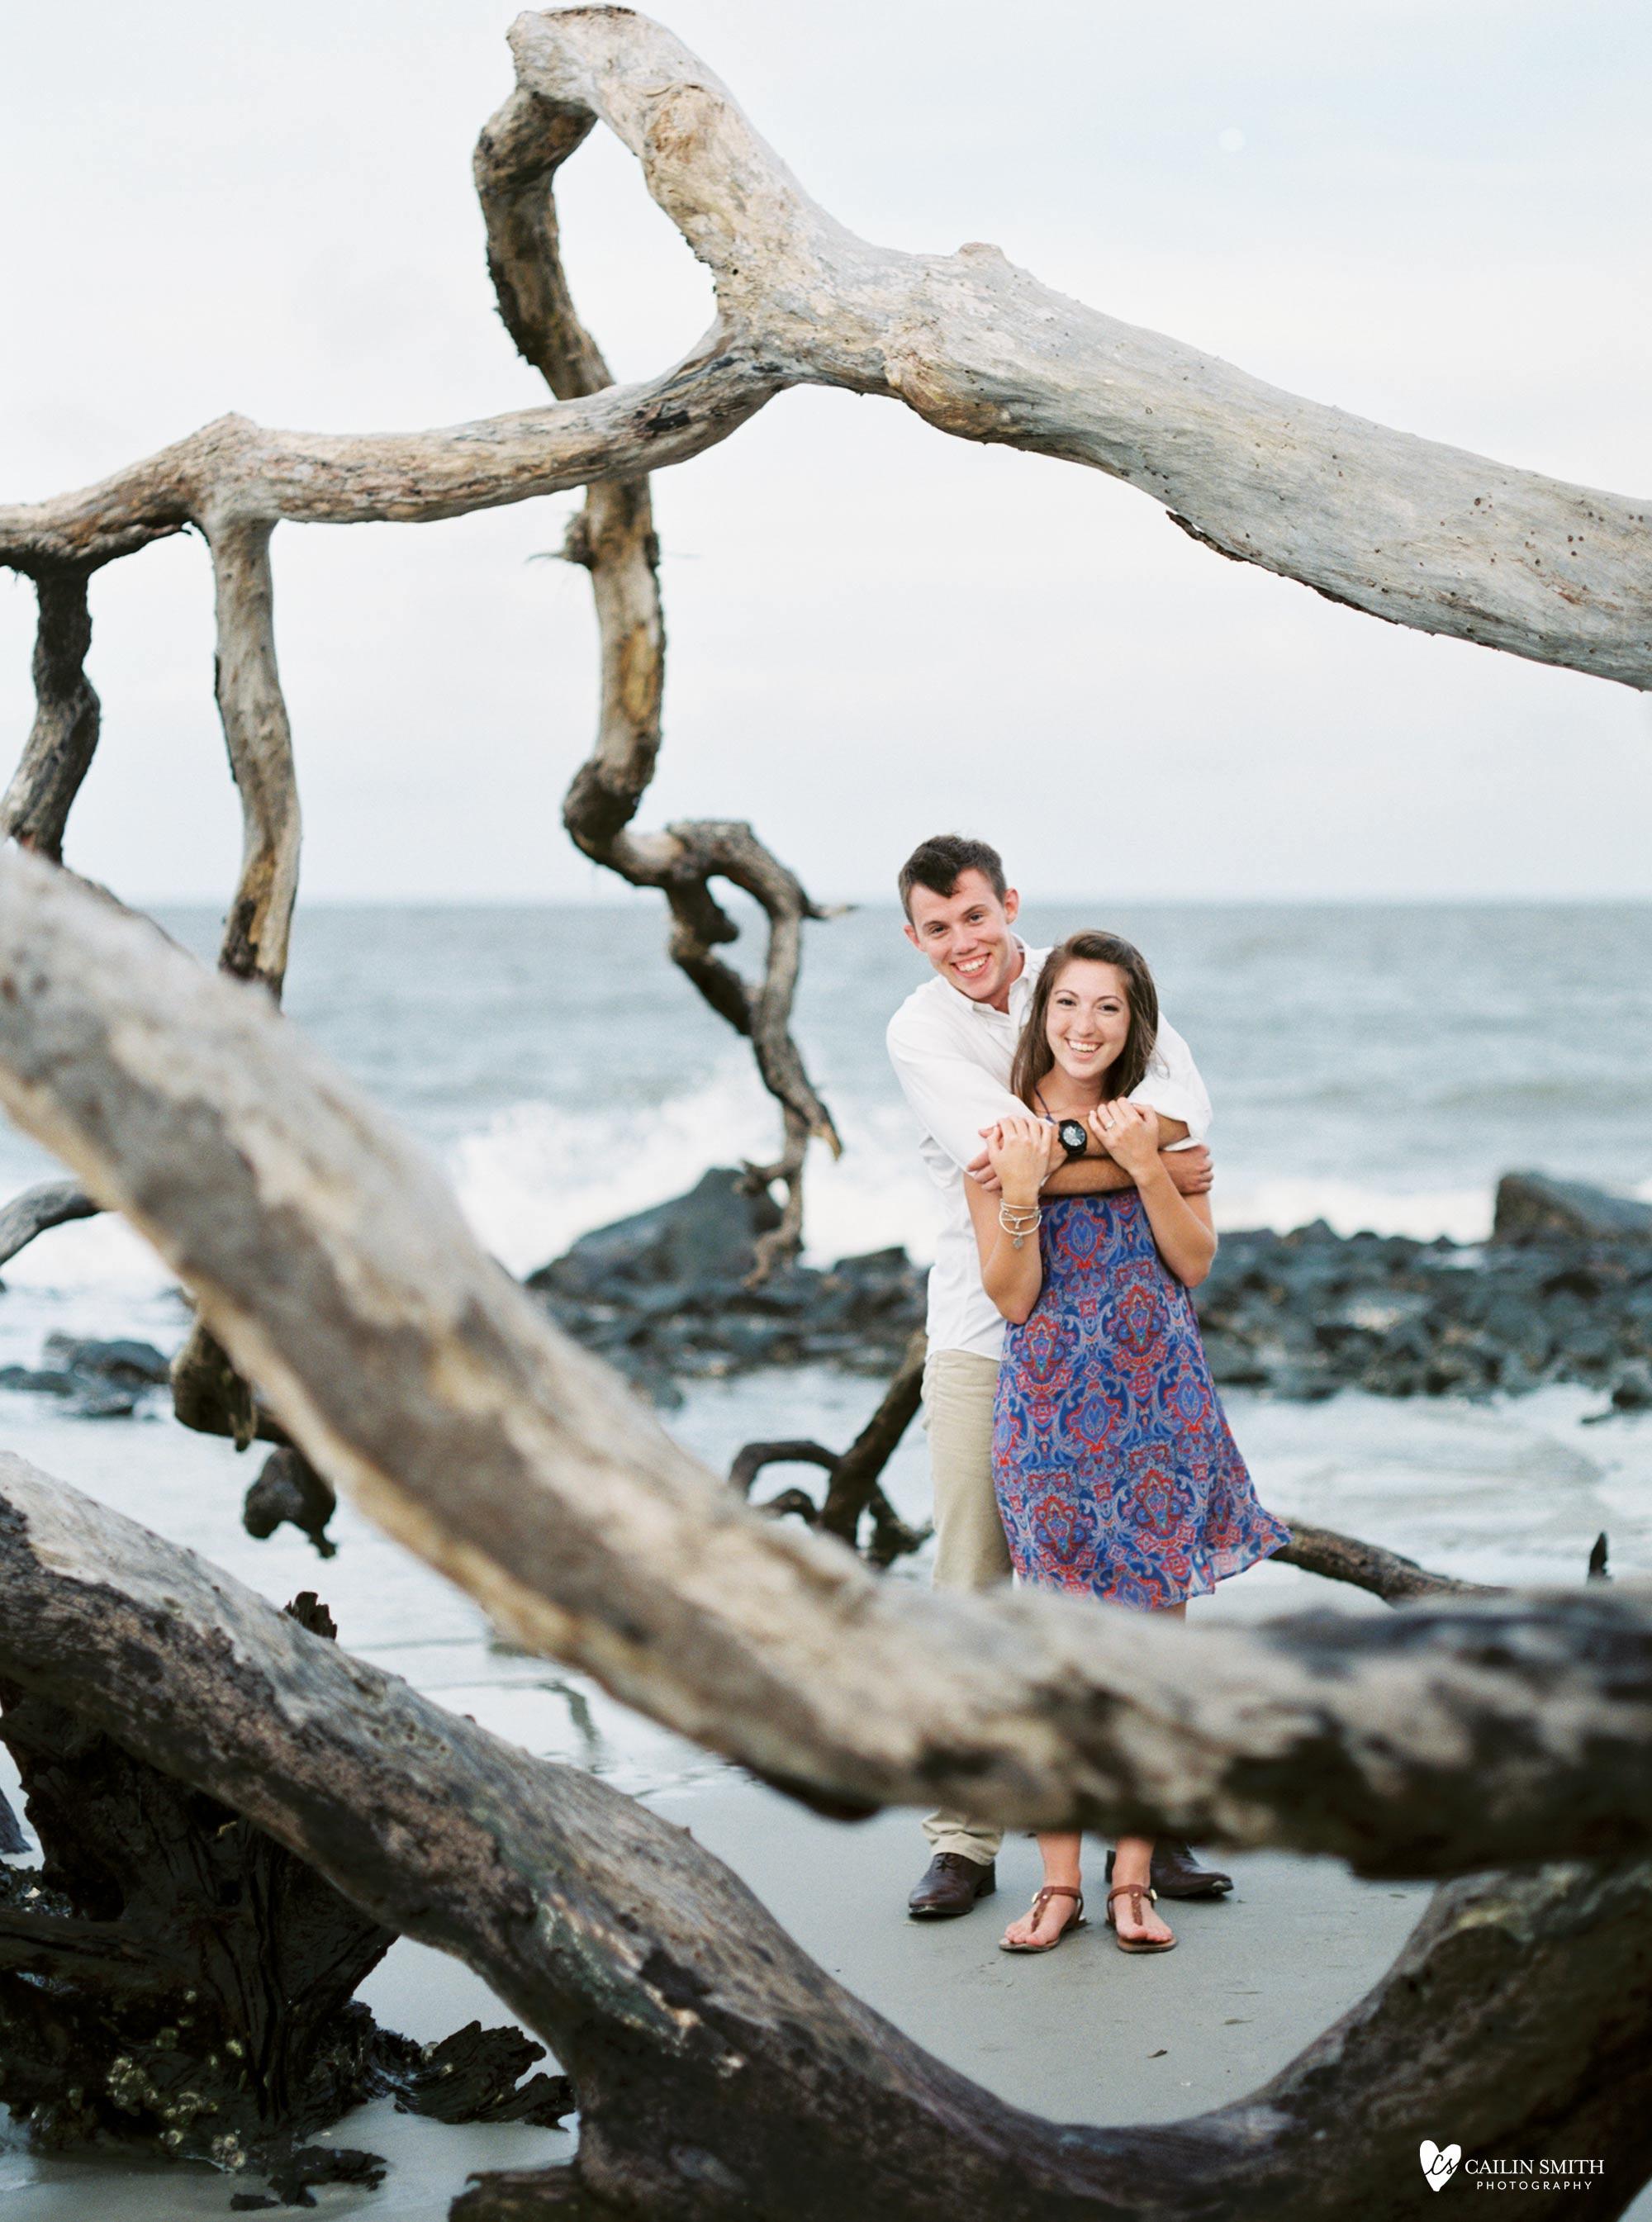 Jacqueline_Matt_Jekyll_Island_Engagement_Photography_Driftwood_Beach_Engagement_16.jpg